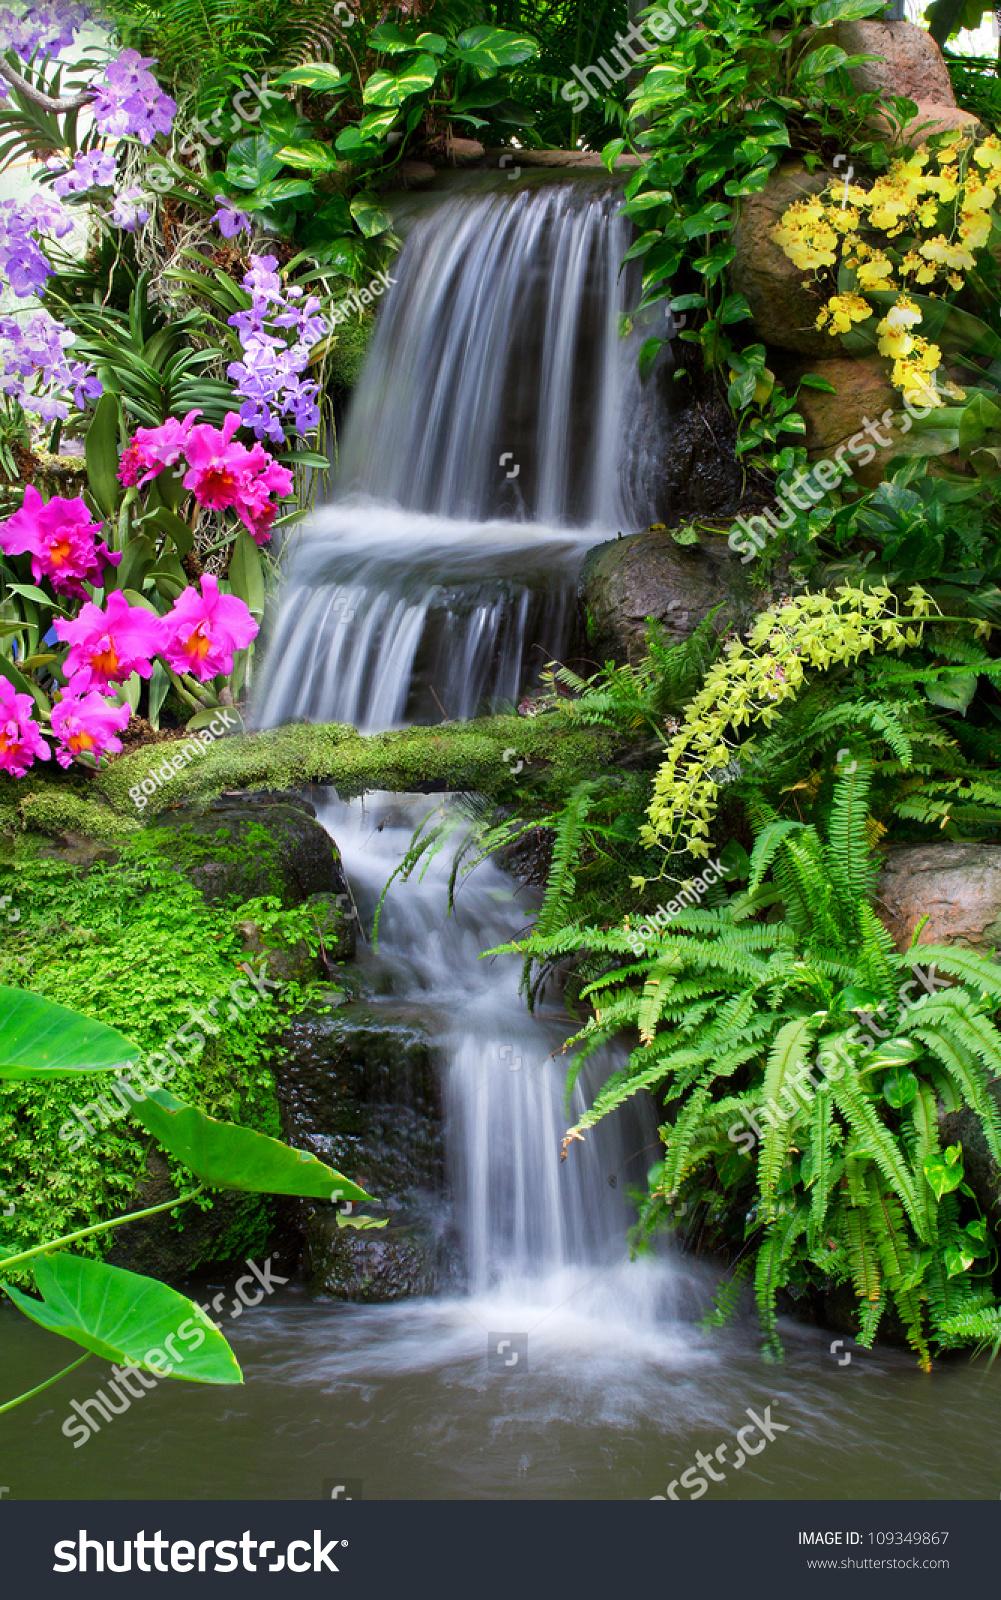 Waterfall In Garden Stock Photo 109349867 : Shutterstock